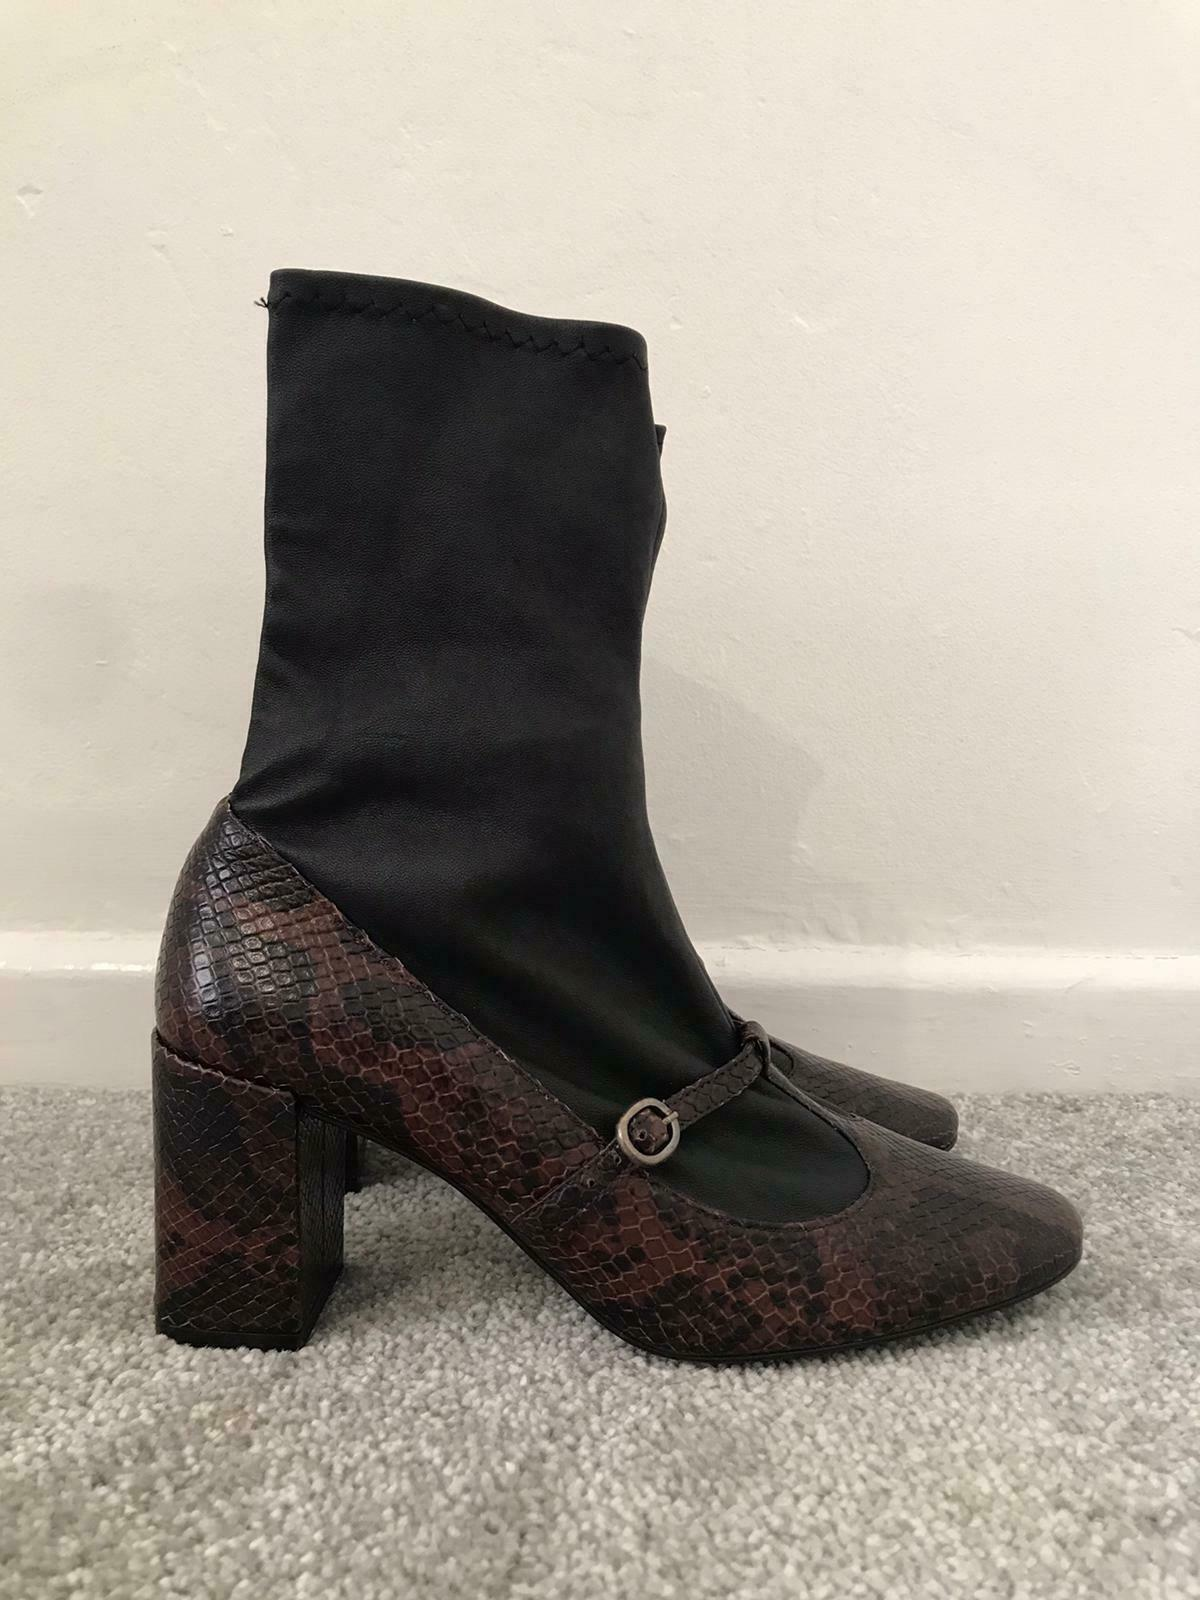 Zara Boots Size 4 Brown Snakeskin Calf Pull On Sock High Heel Boots EU 37